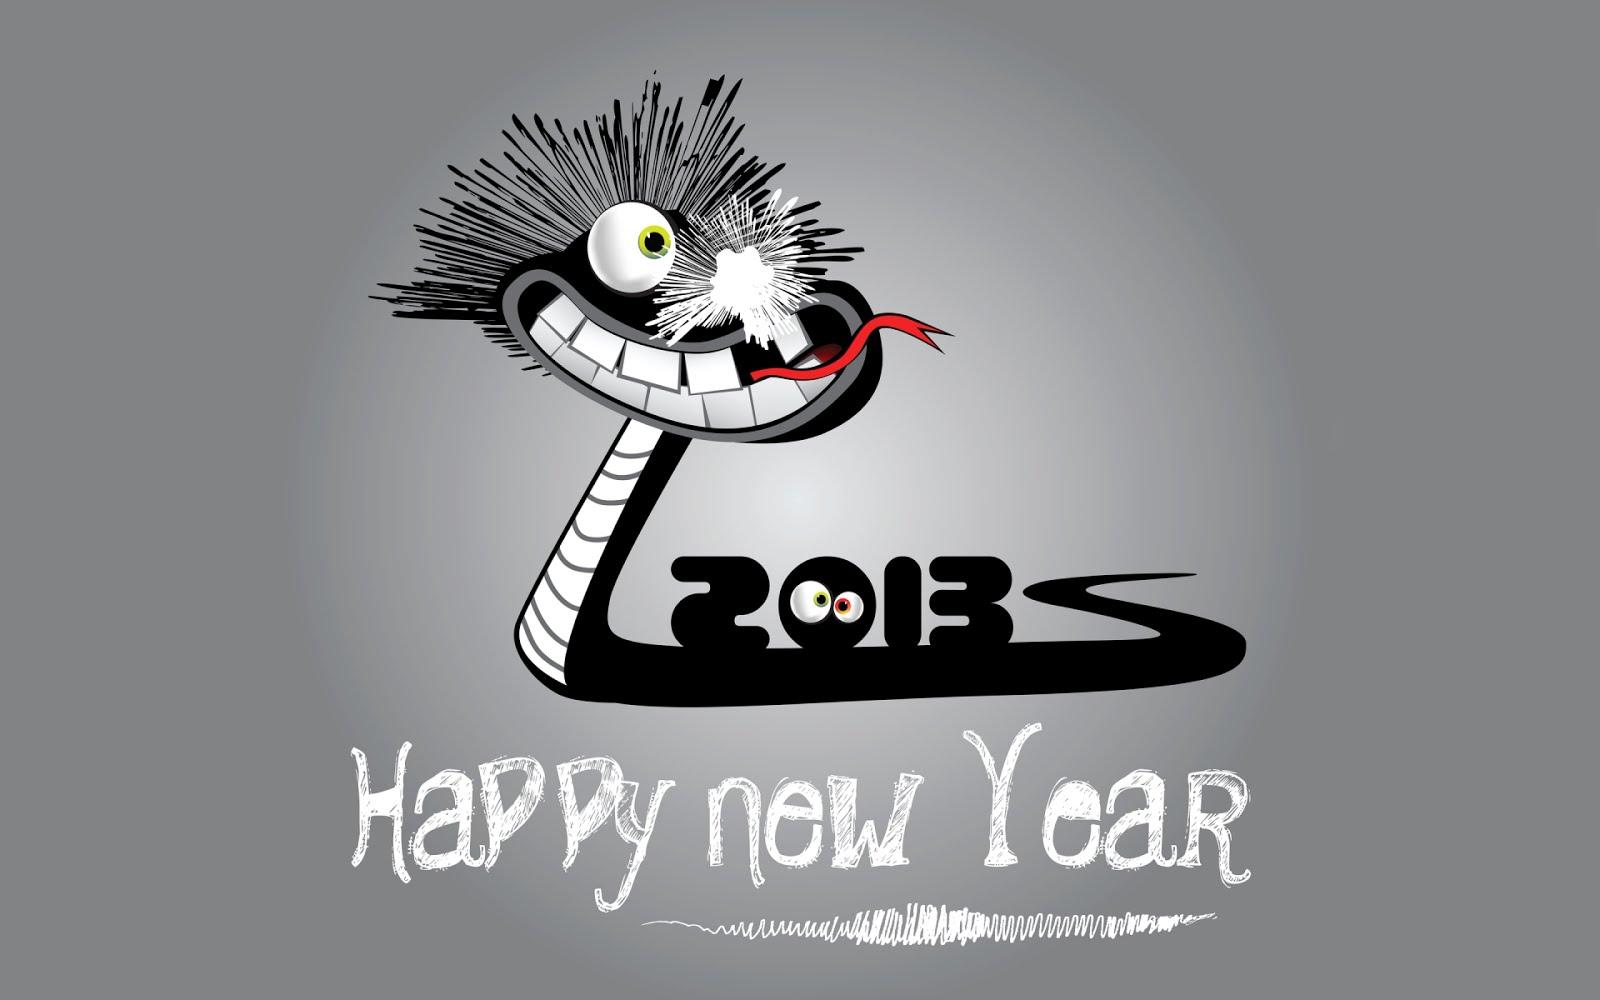 http://1.bp.blogspot.com/-v5Y_XEackdA/UJxRcta89DI/AAAAAAABPjM/VO3fZBwuAz0/s1600/feliz-a%25C3%25B1o-nuevo-2013-happy-new-year-1920x1200-wallpaper-.jpg